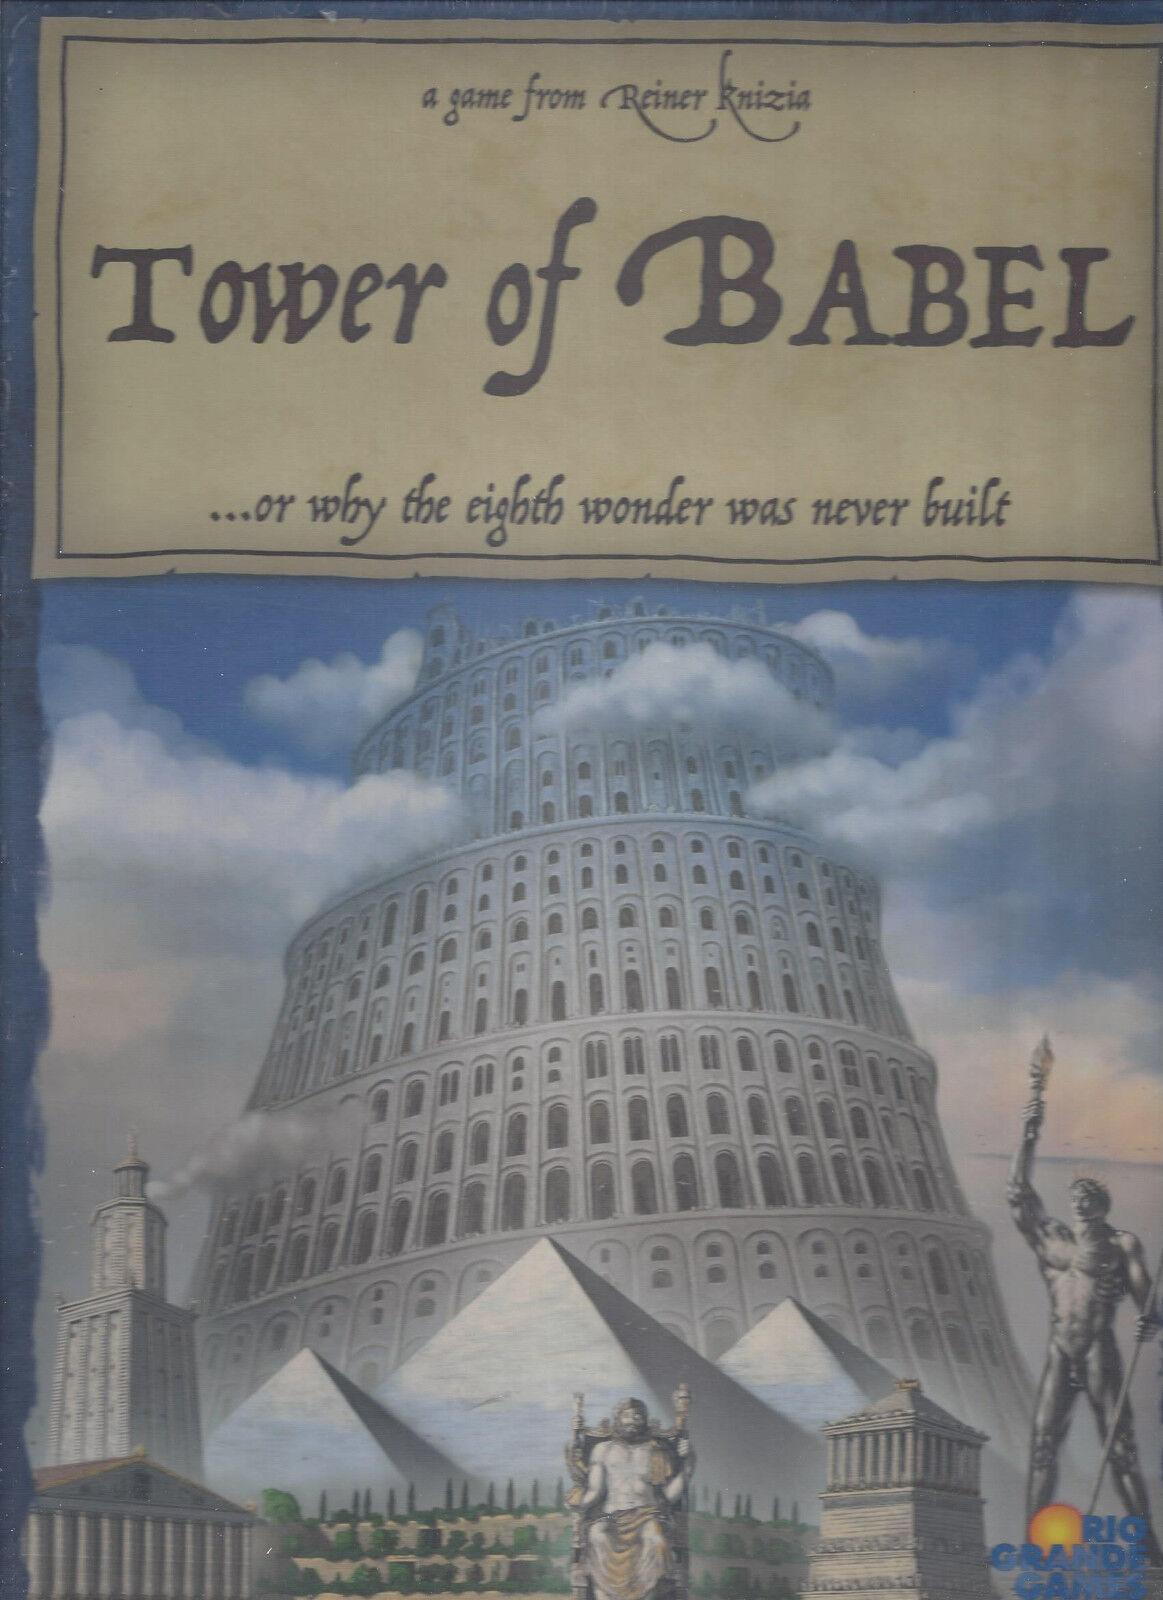 Tower of Babel Board Game NIB   Factory Sealed  Reiner Knizia  FREE SHIPPING